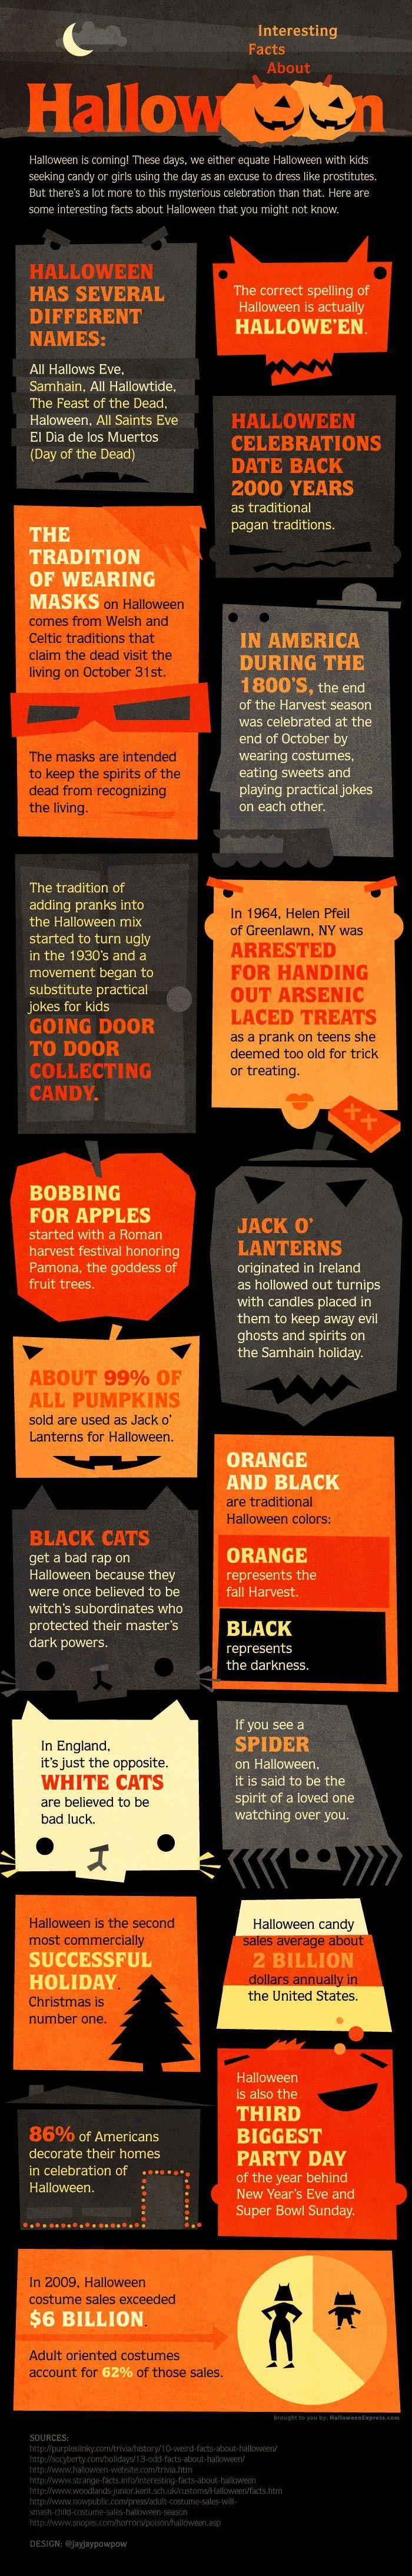 Halloween facts.